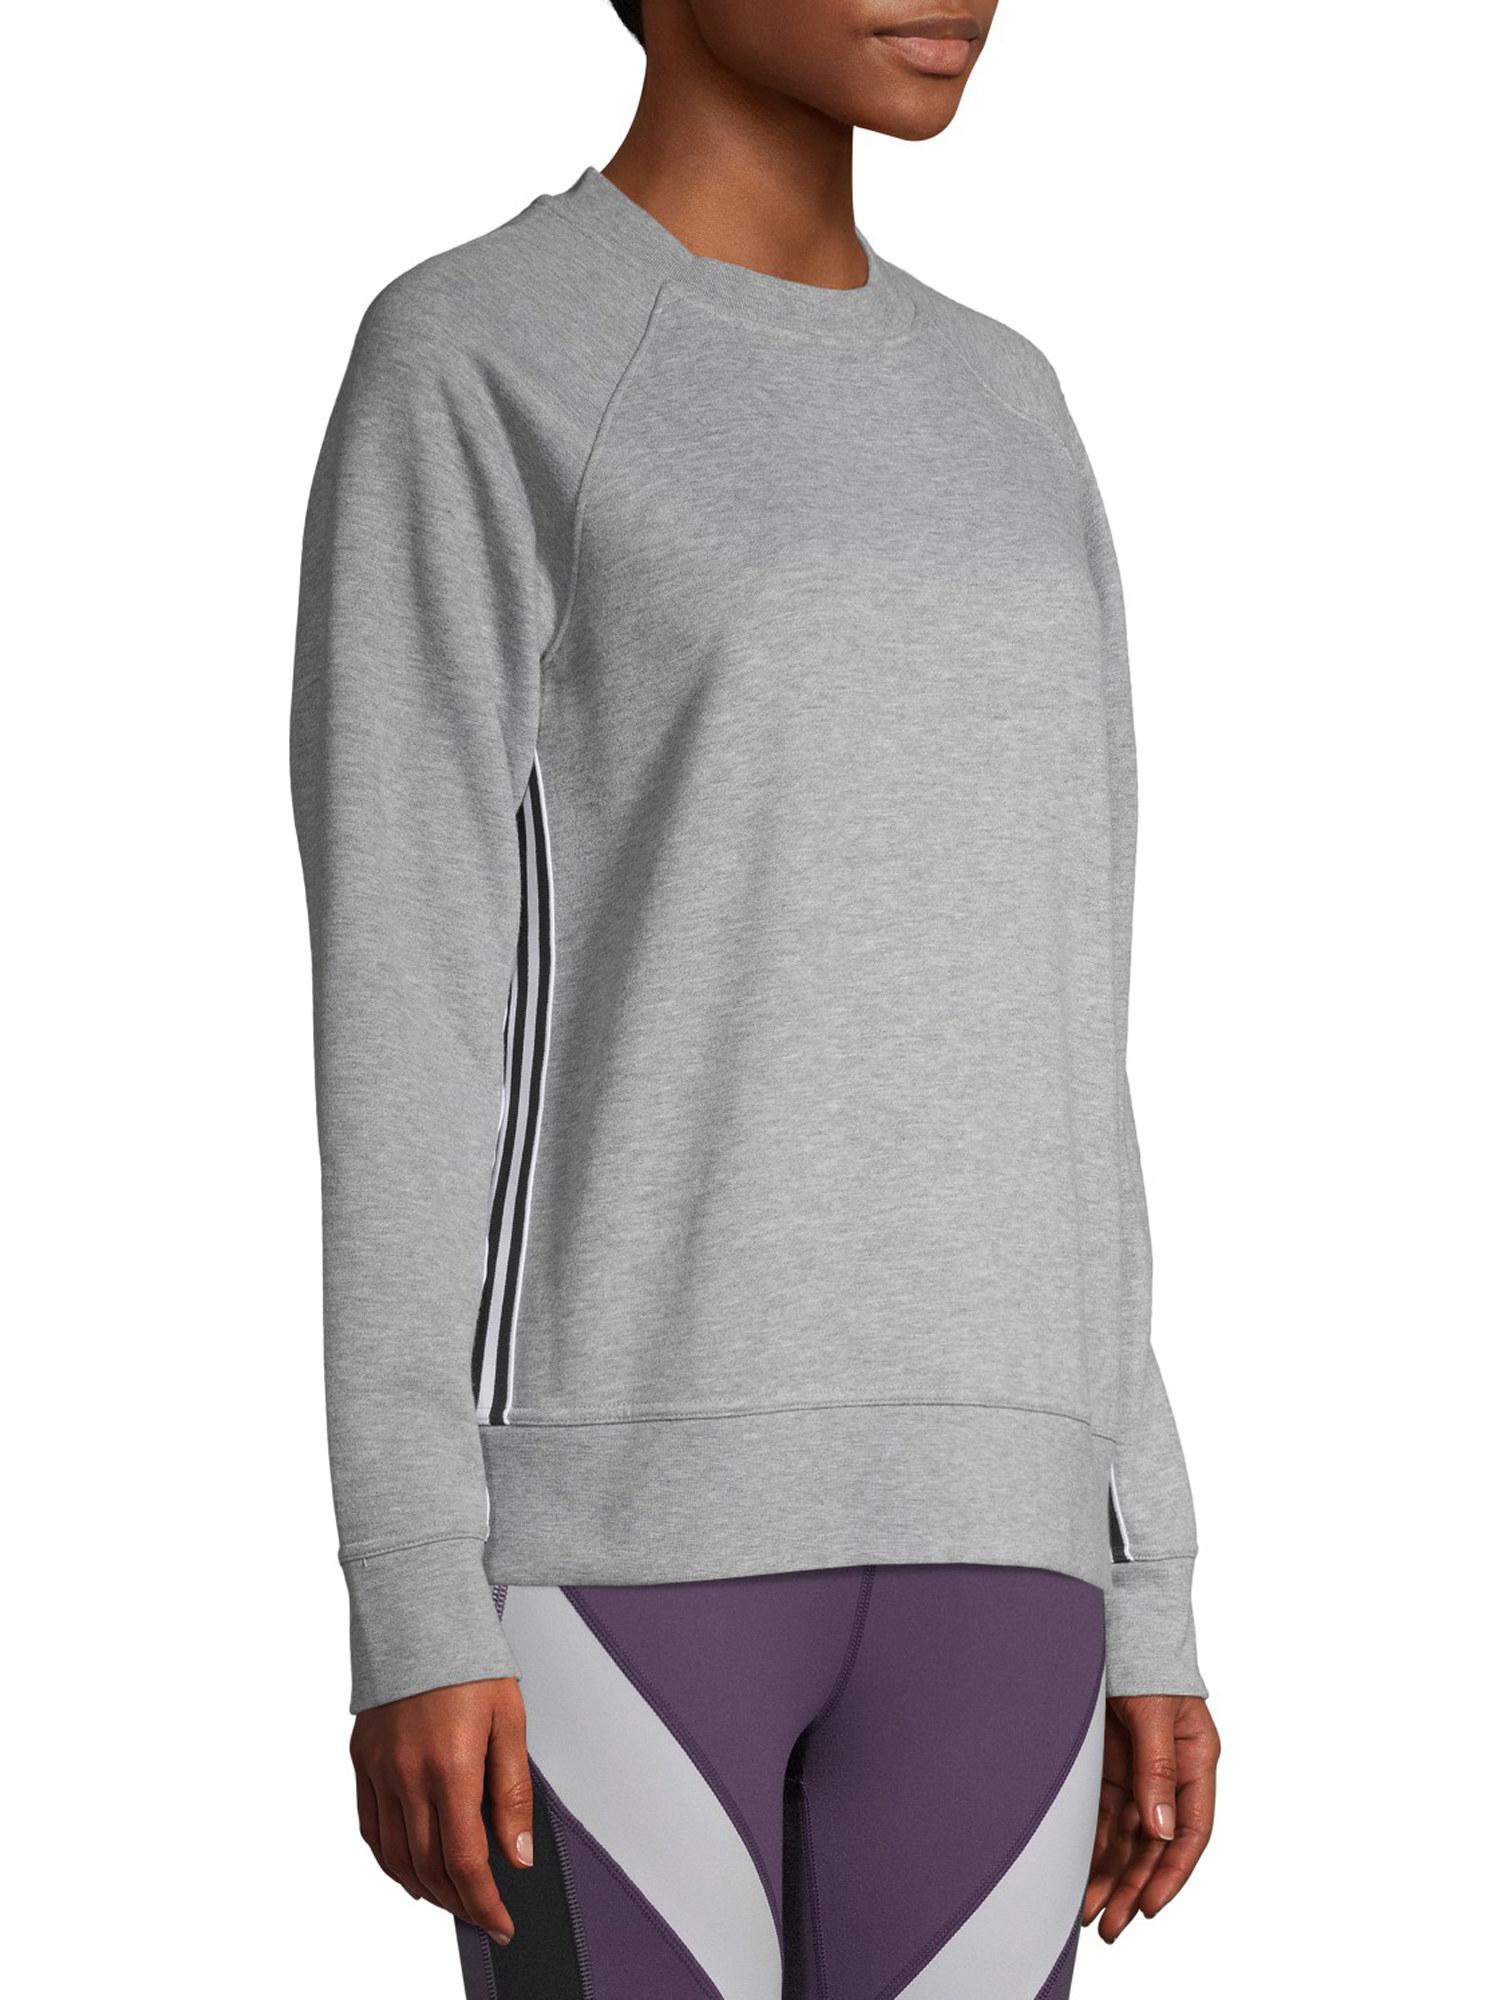 person wearing gray sweatshirt with purple leggings